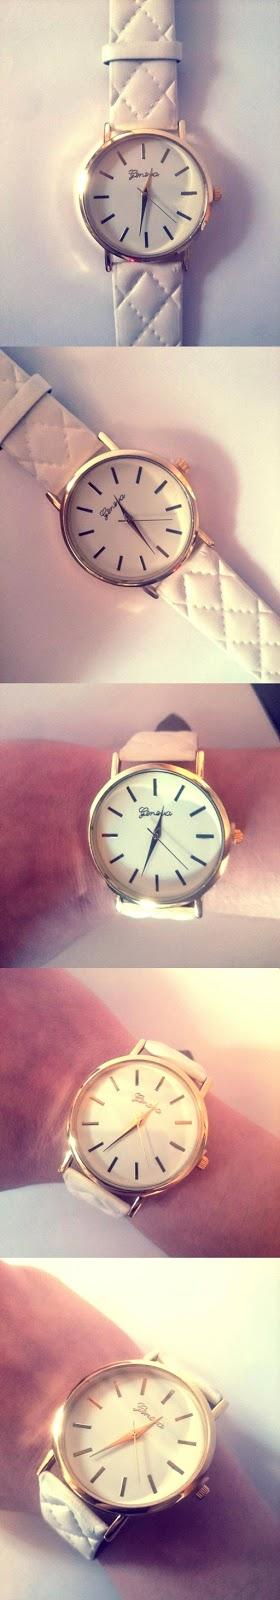 biały zegarek, zegarek sammydress, zegarek ze złotymi elementami